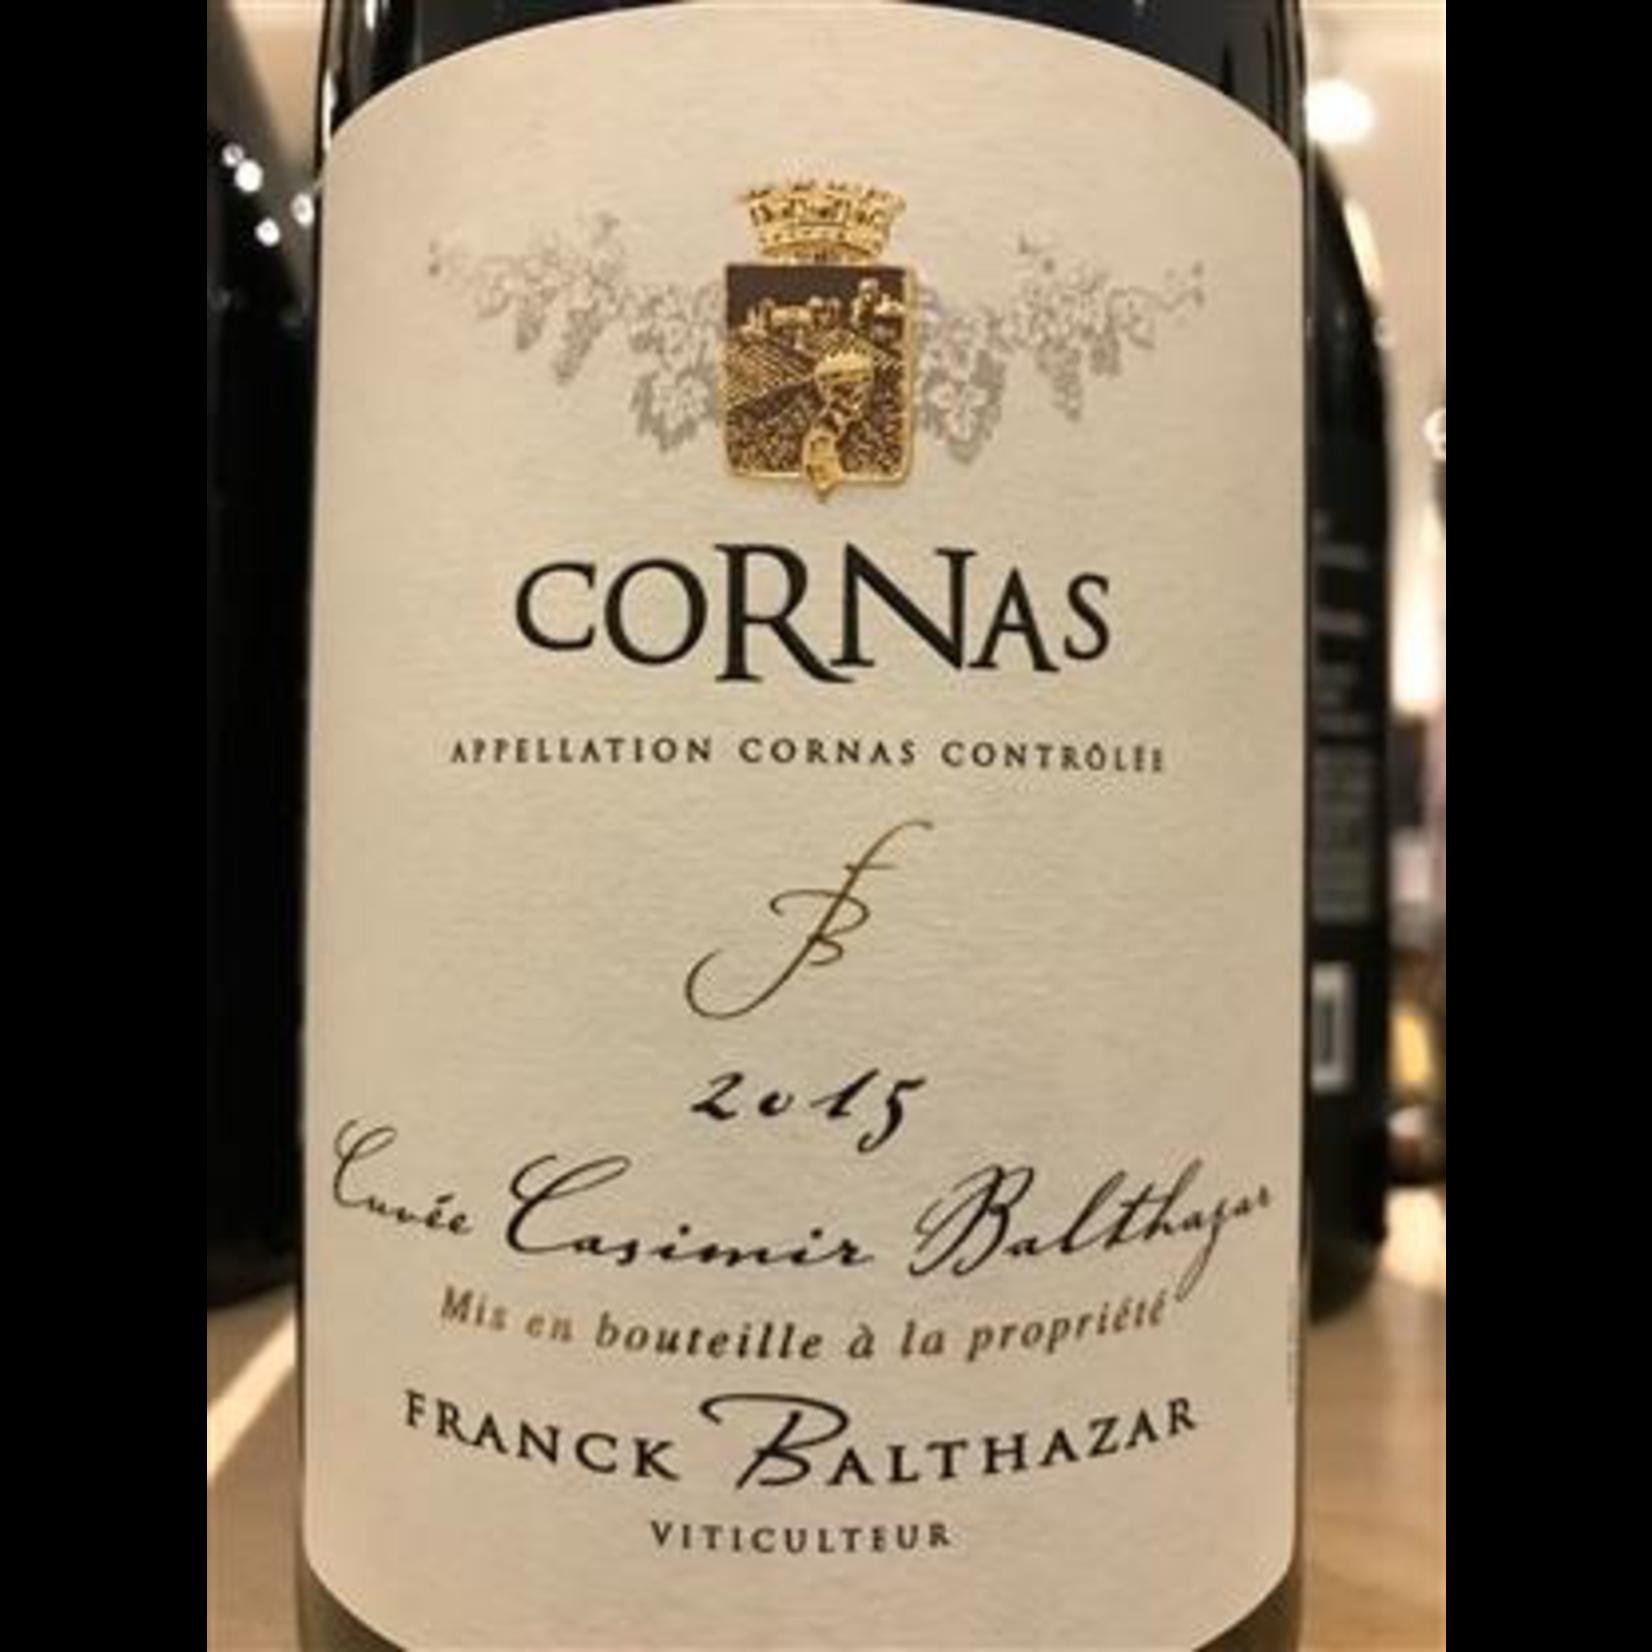 Wine Frank Balthazar Cornas Cuvee Casimir 2012